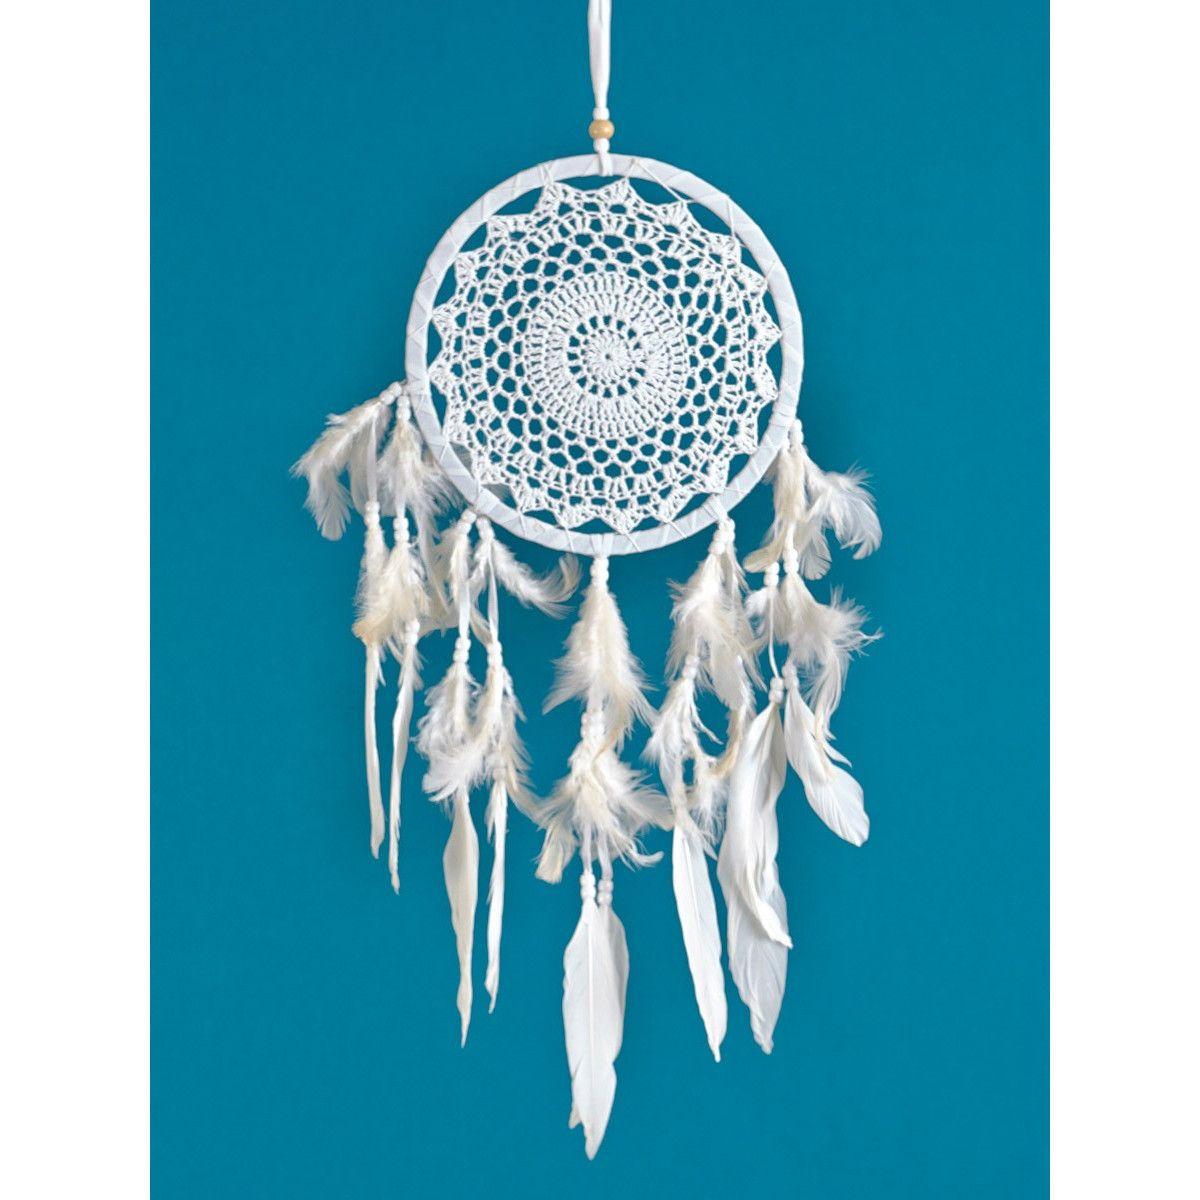 Attrape-rêve crochet et plumes blanc